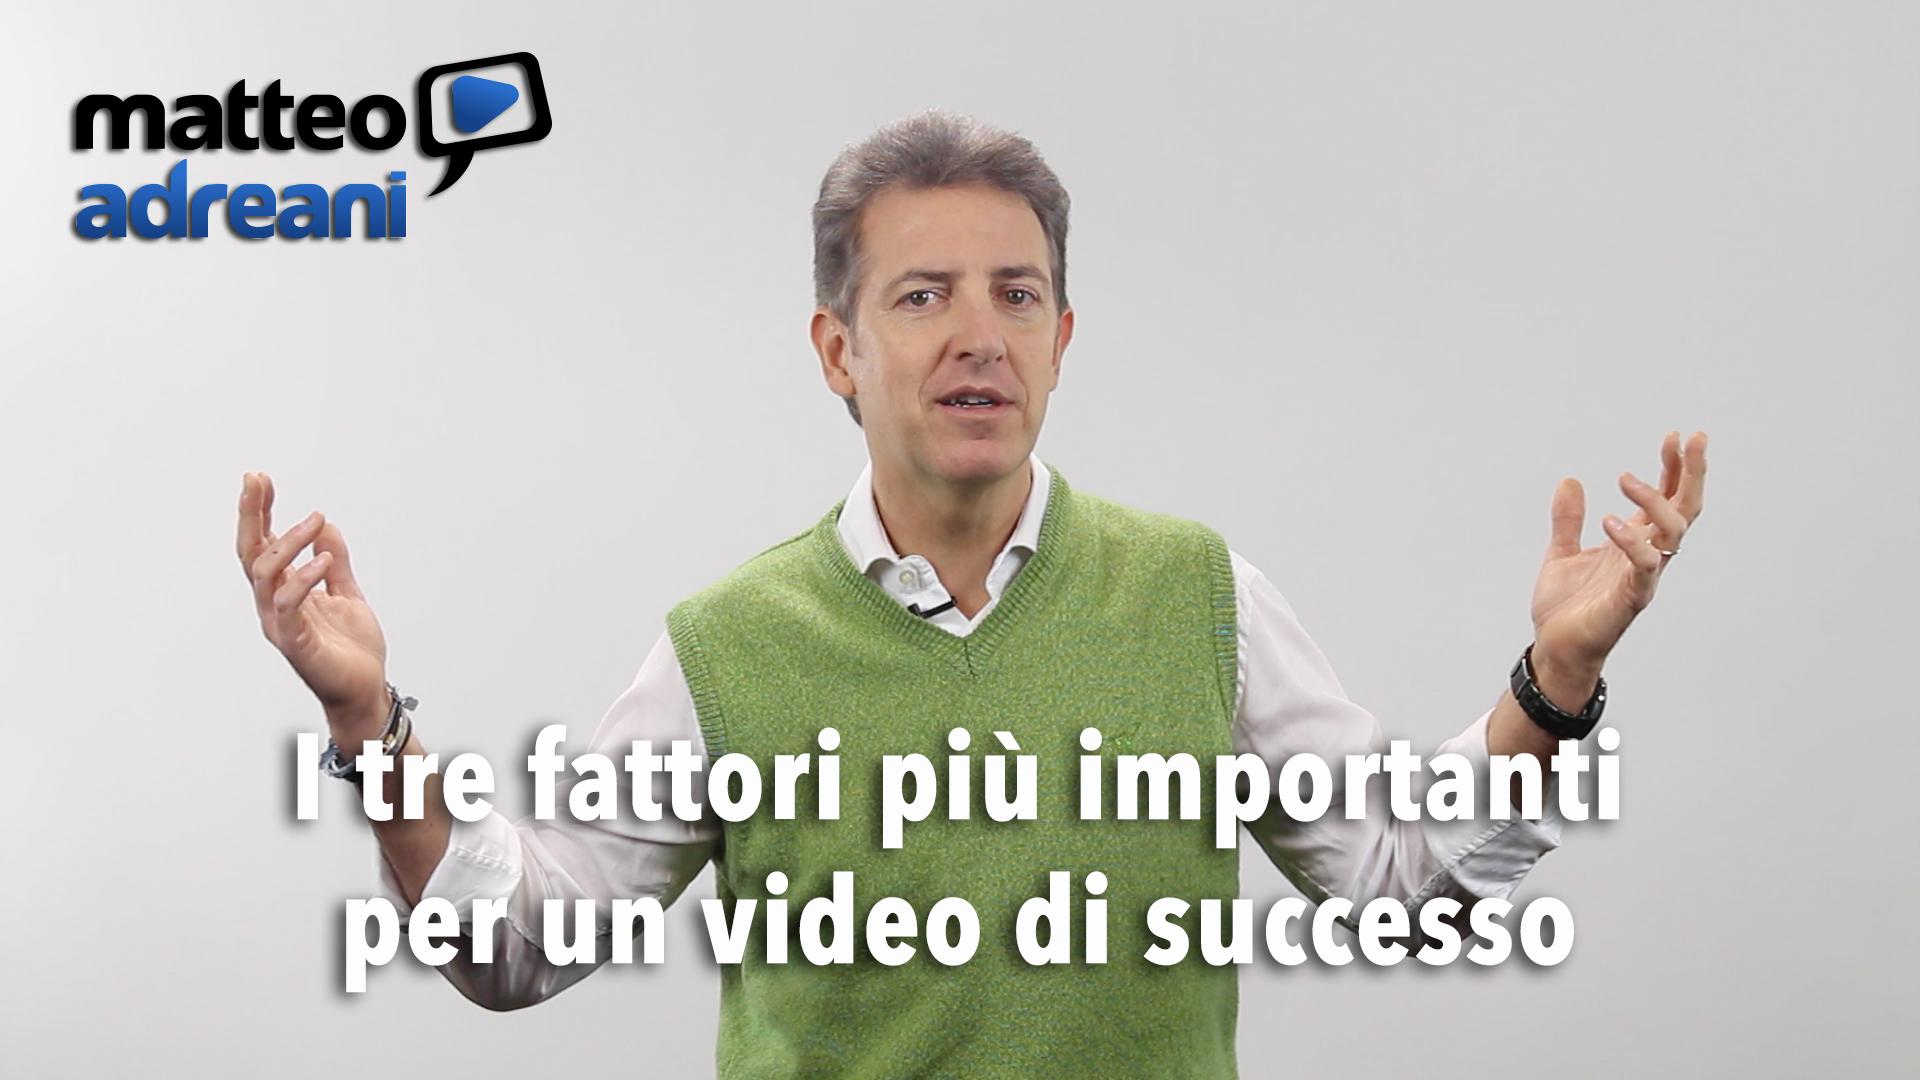 I-tre-fattori-piu-importanti-per-un-video-di-successo-YouTube